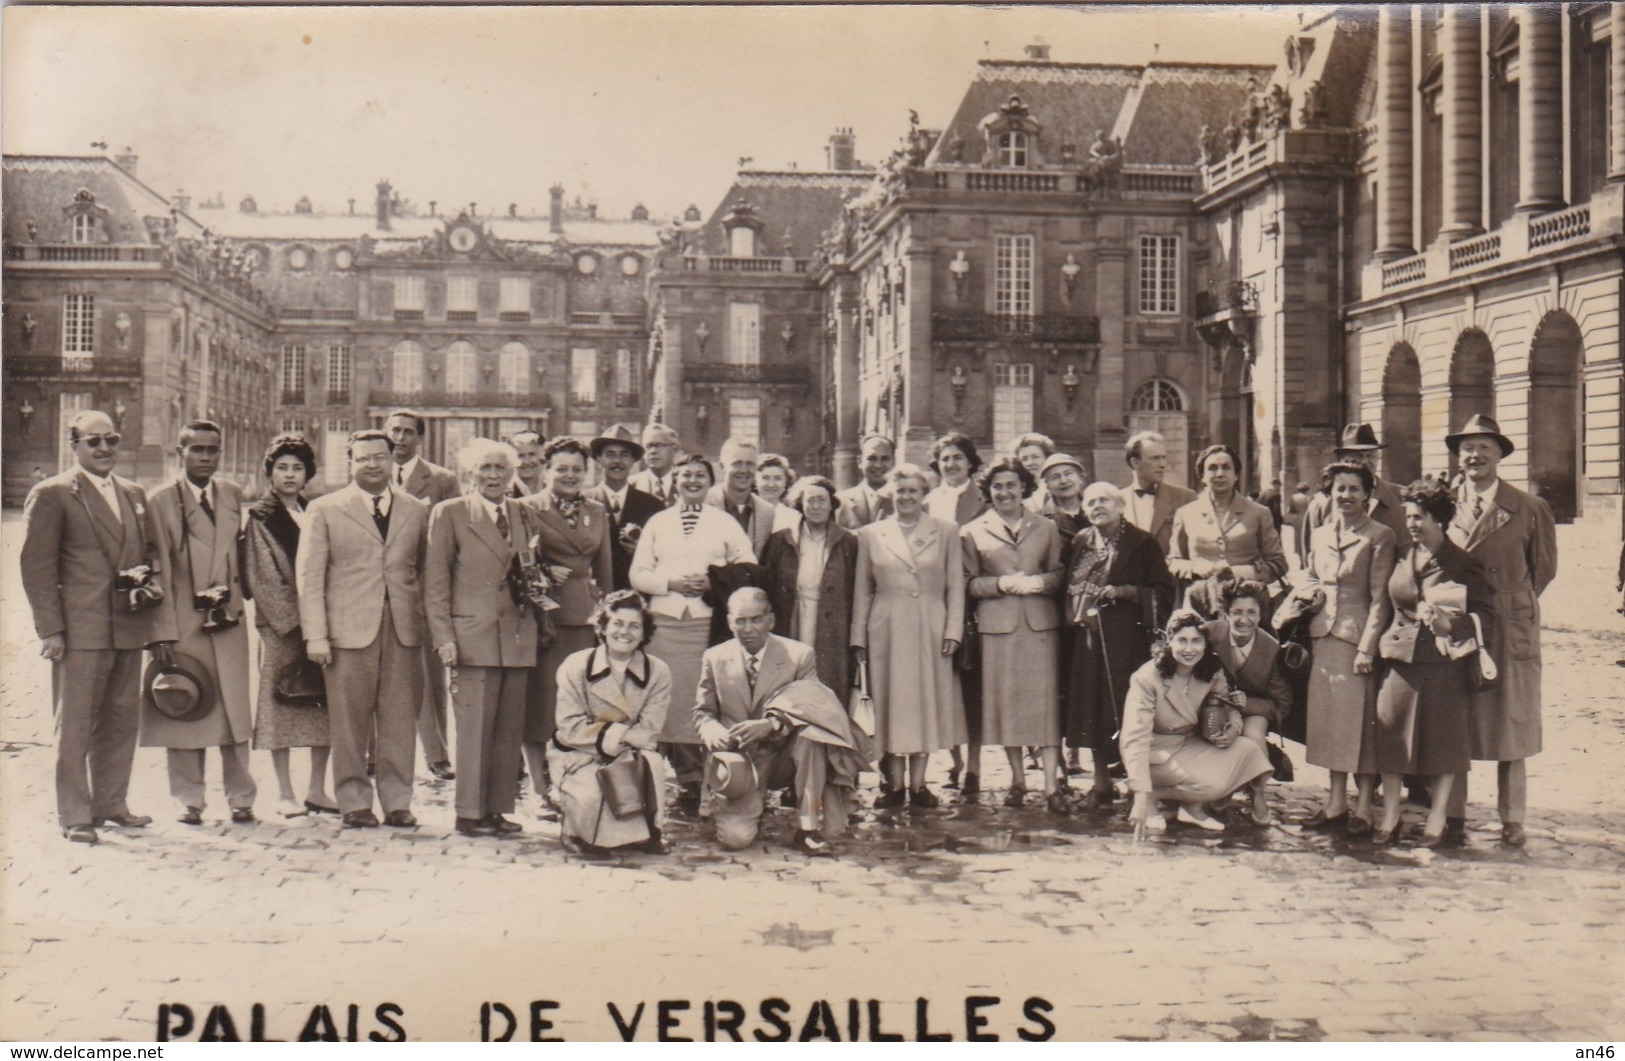 PALAIS DE VERSAILLES PARIGI  FOTO AUTENTICA 100% - Fotografia